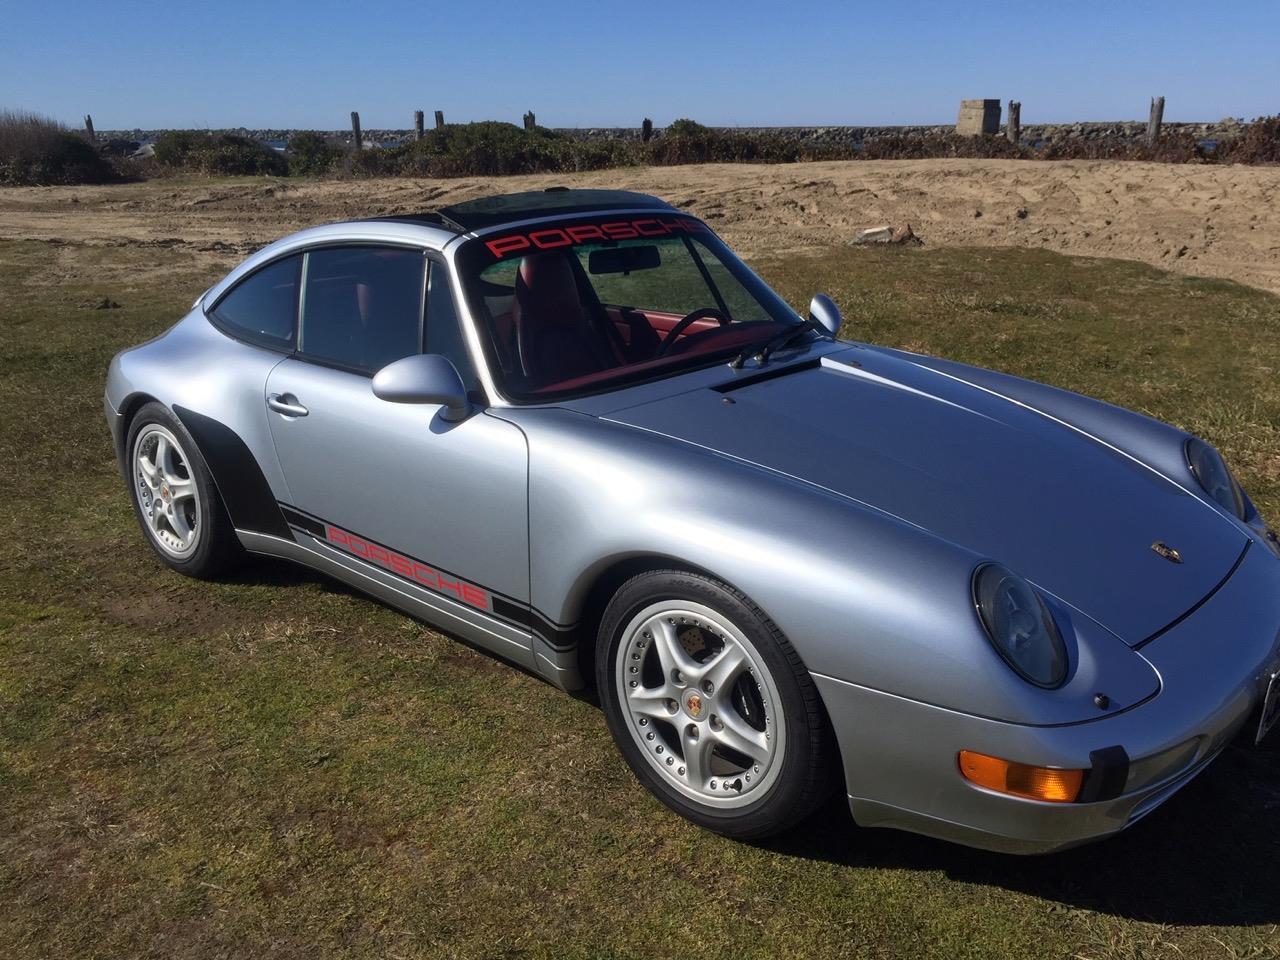 For Sale: 1996 Porsche 993 in Monterey, California